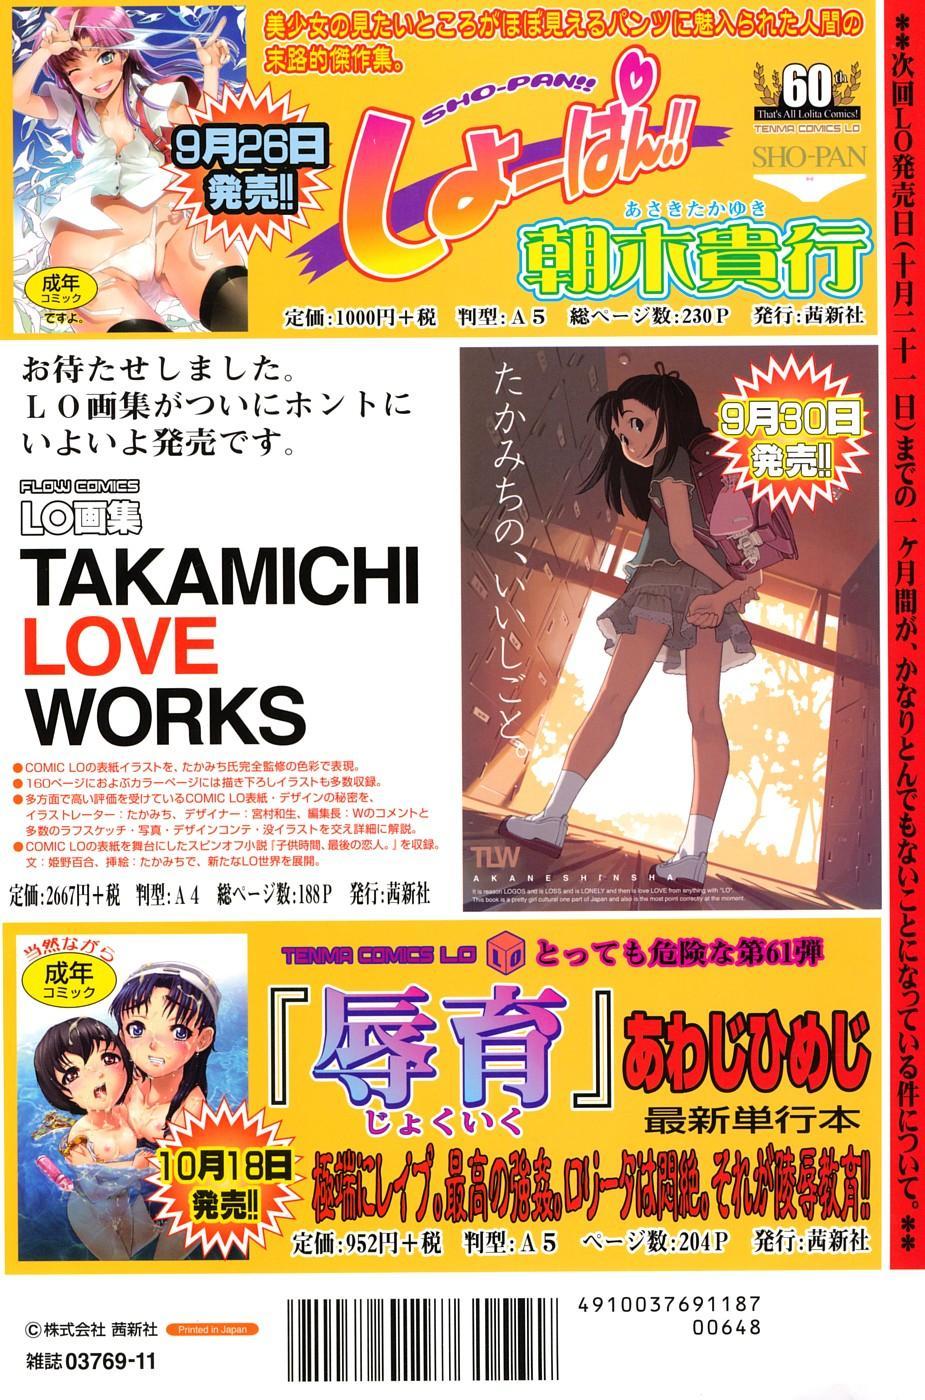 Comic LO 2008-11 Vol. 56 339